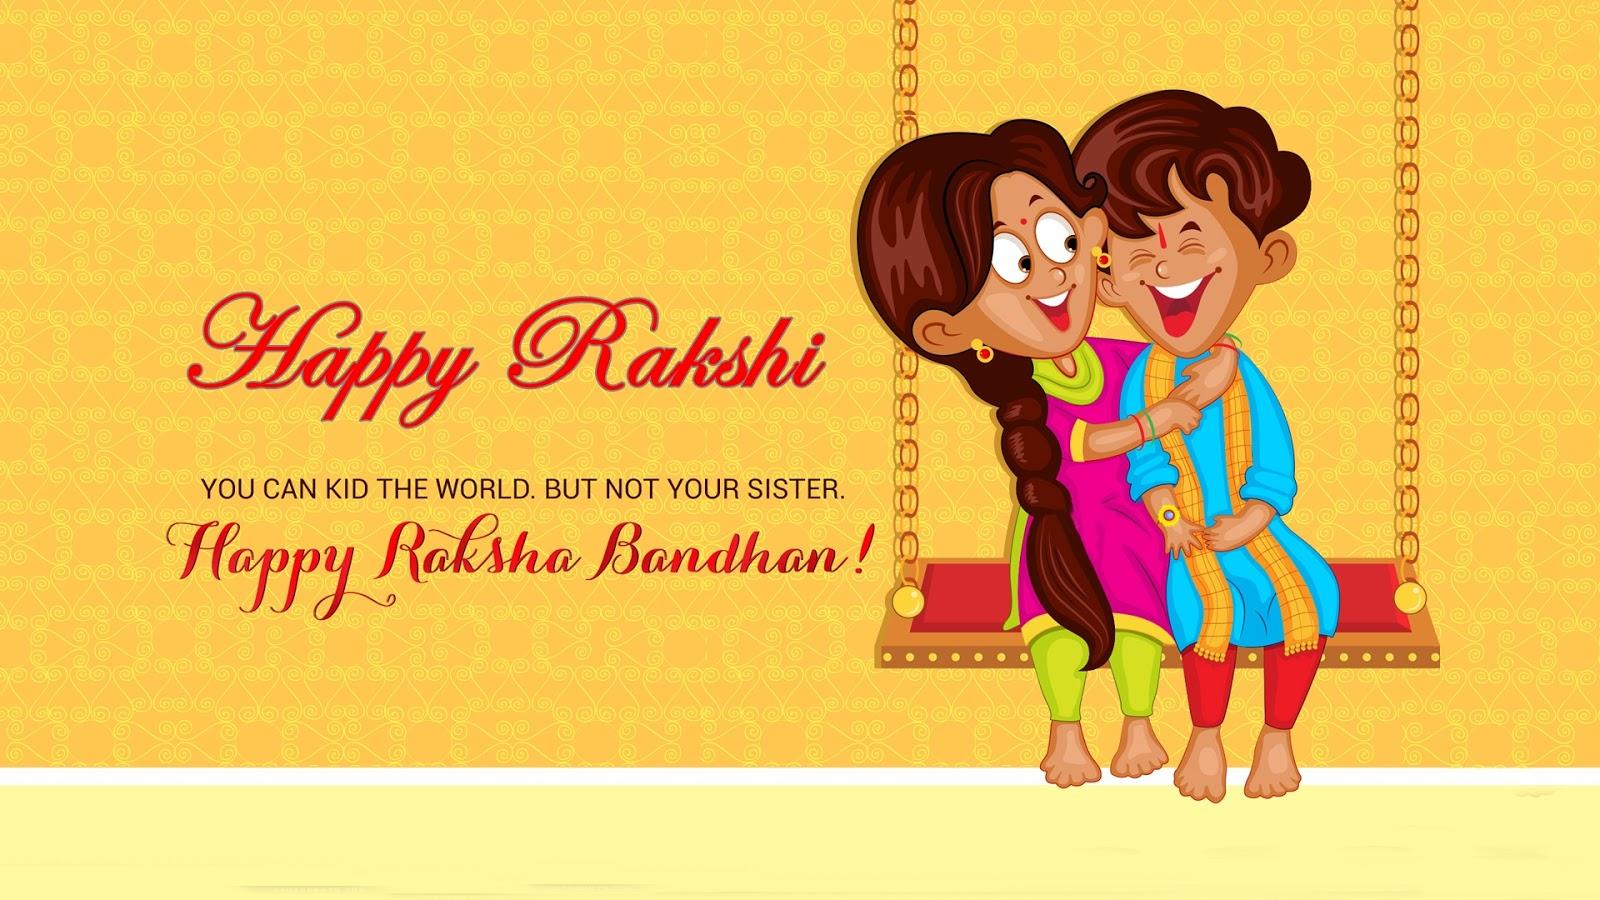 Download Raksha Bandhan Wallpapers For Mobile Raksha Bandhan